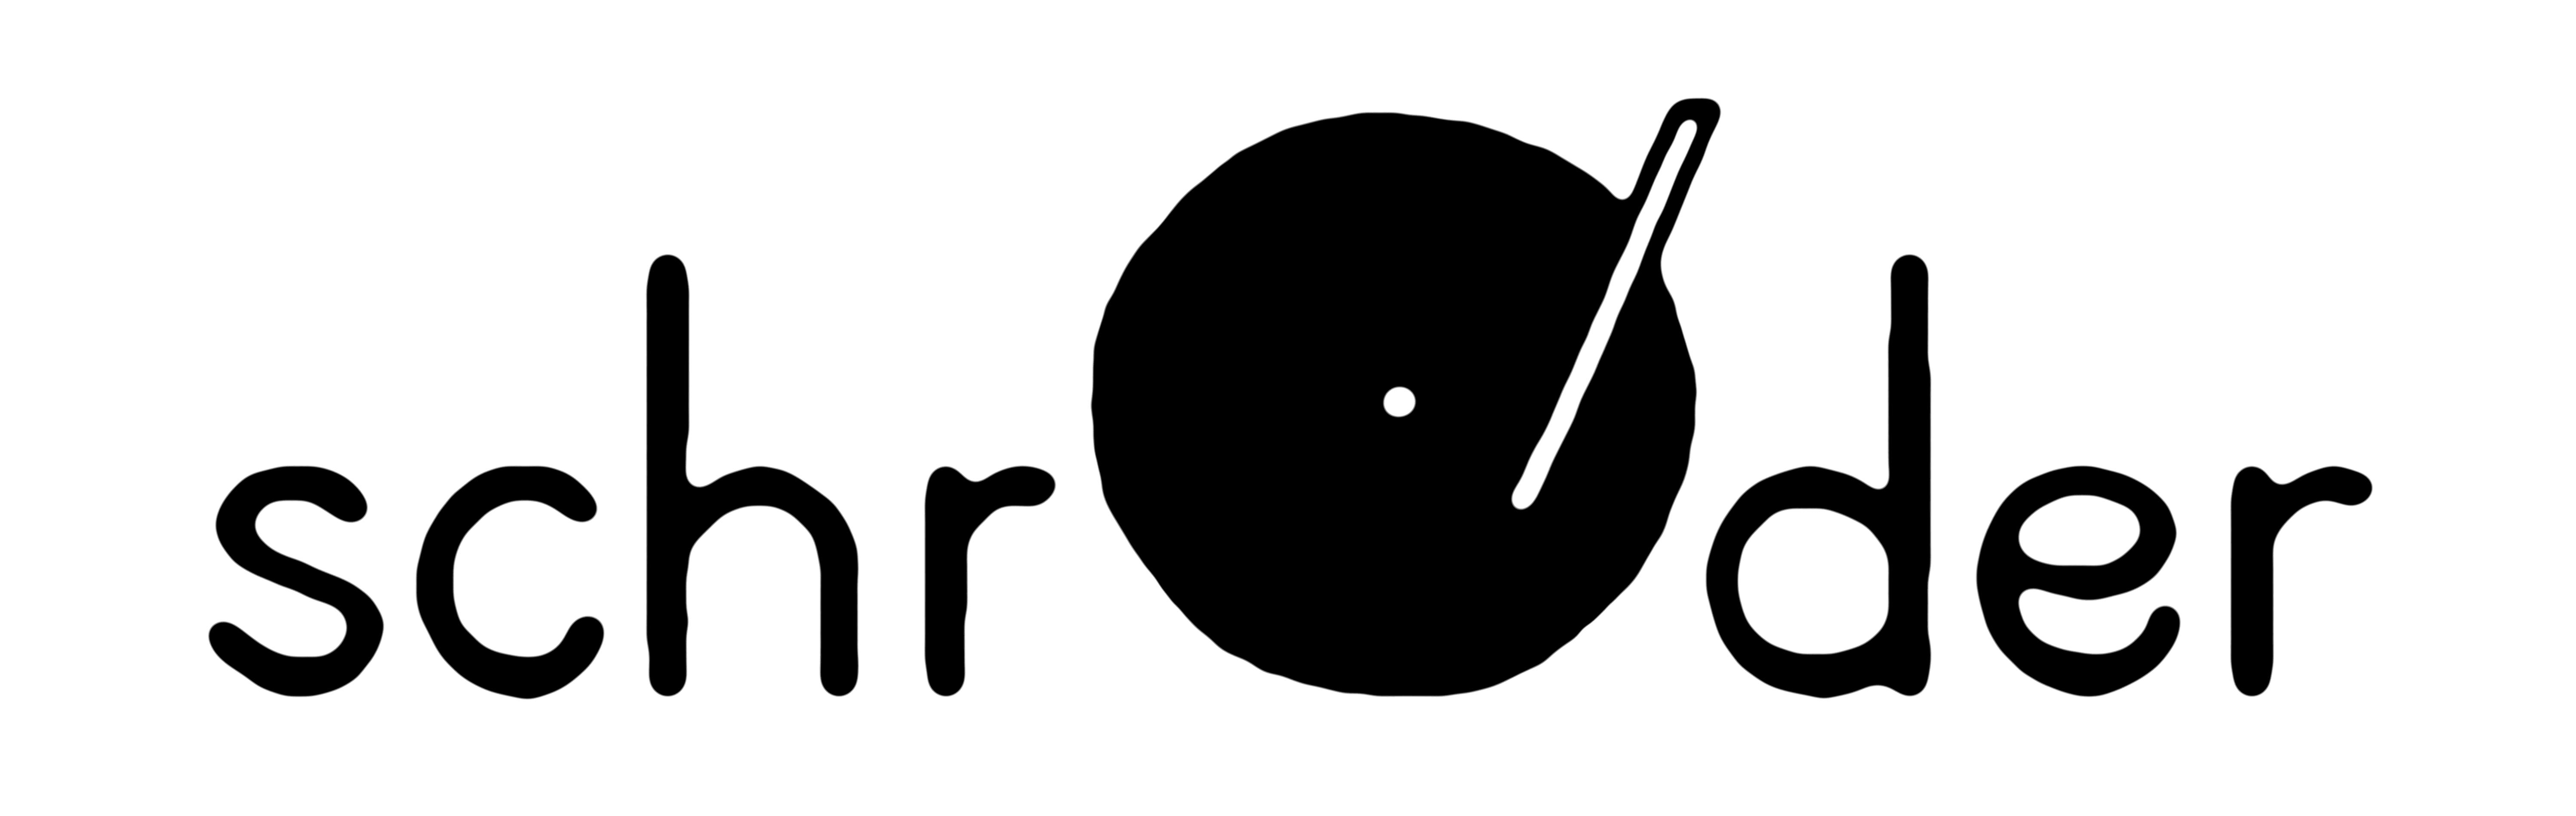 schr-der-logo-a2-regular.jpg